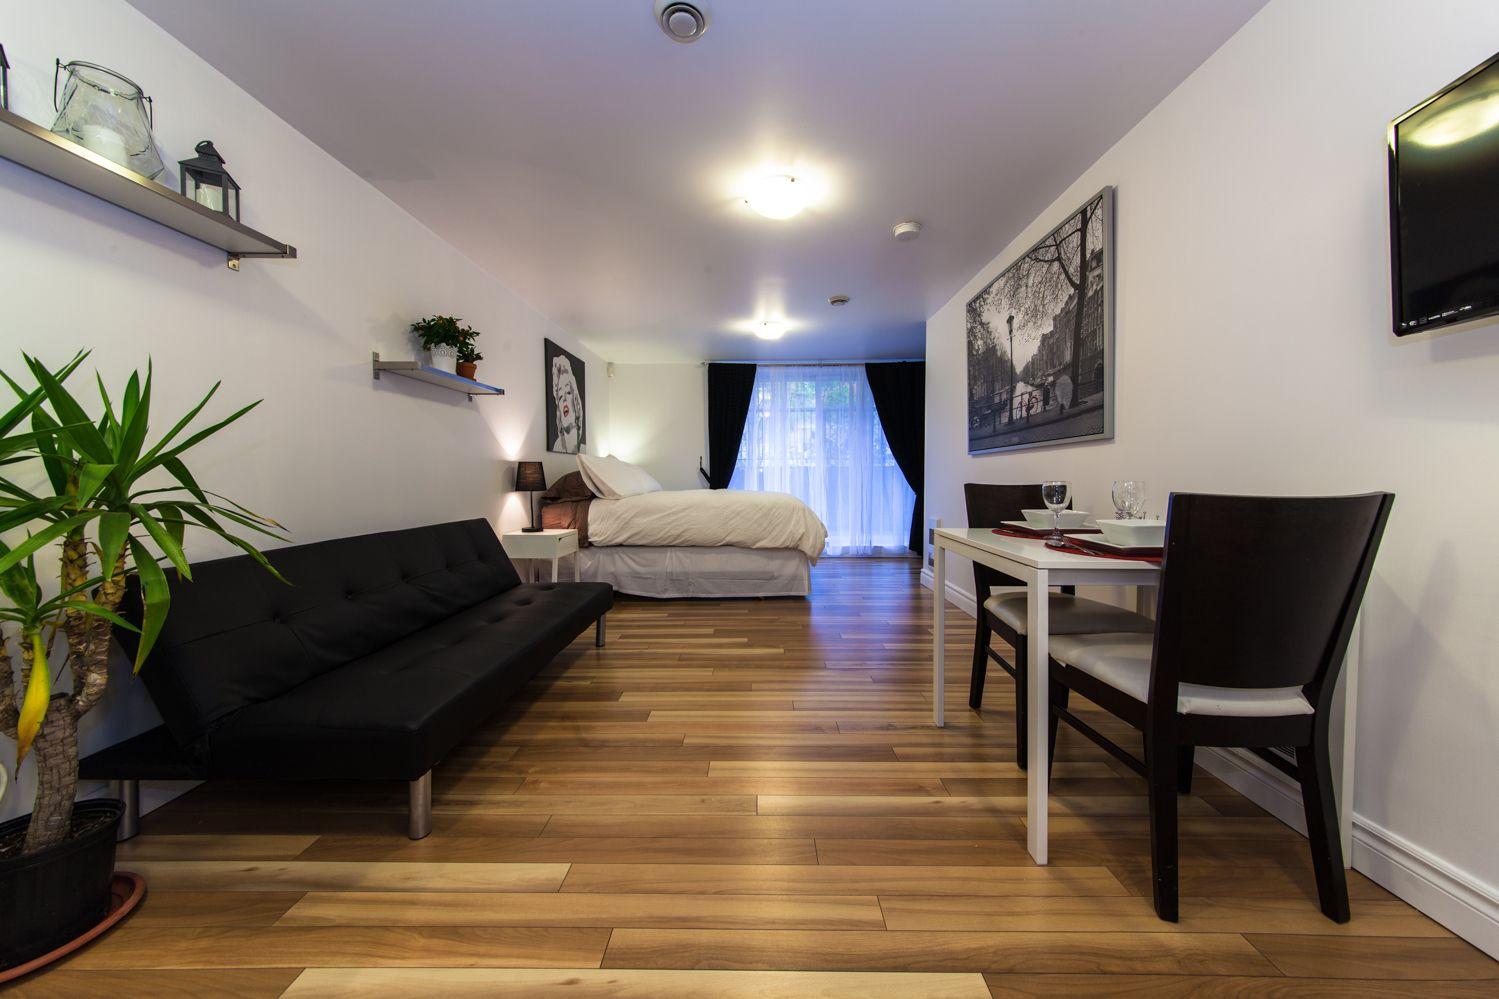 Location appartement meuble a montreal - Location studio meuble toulon ...